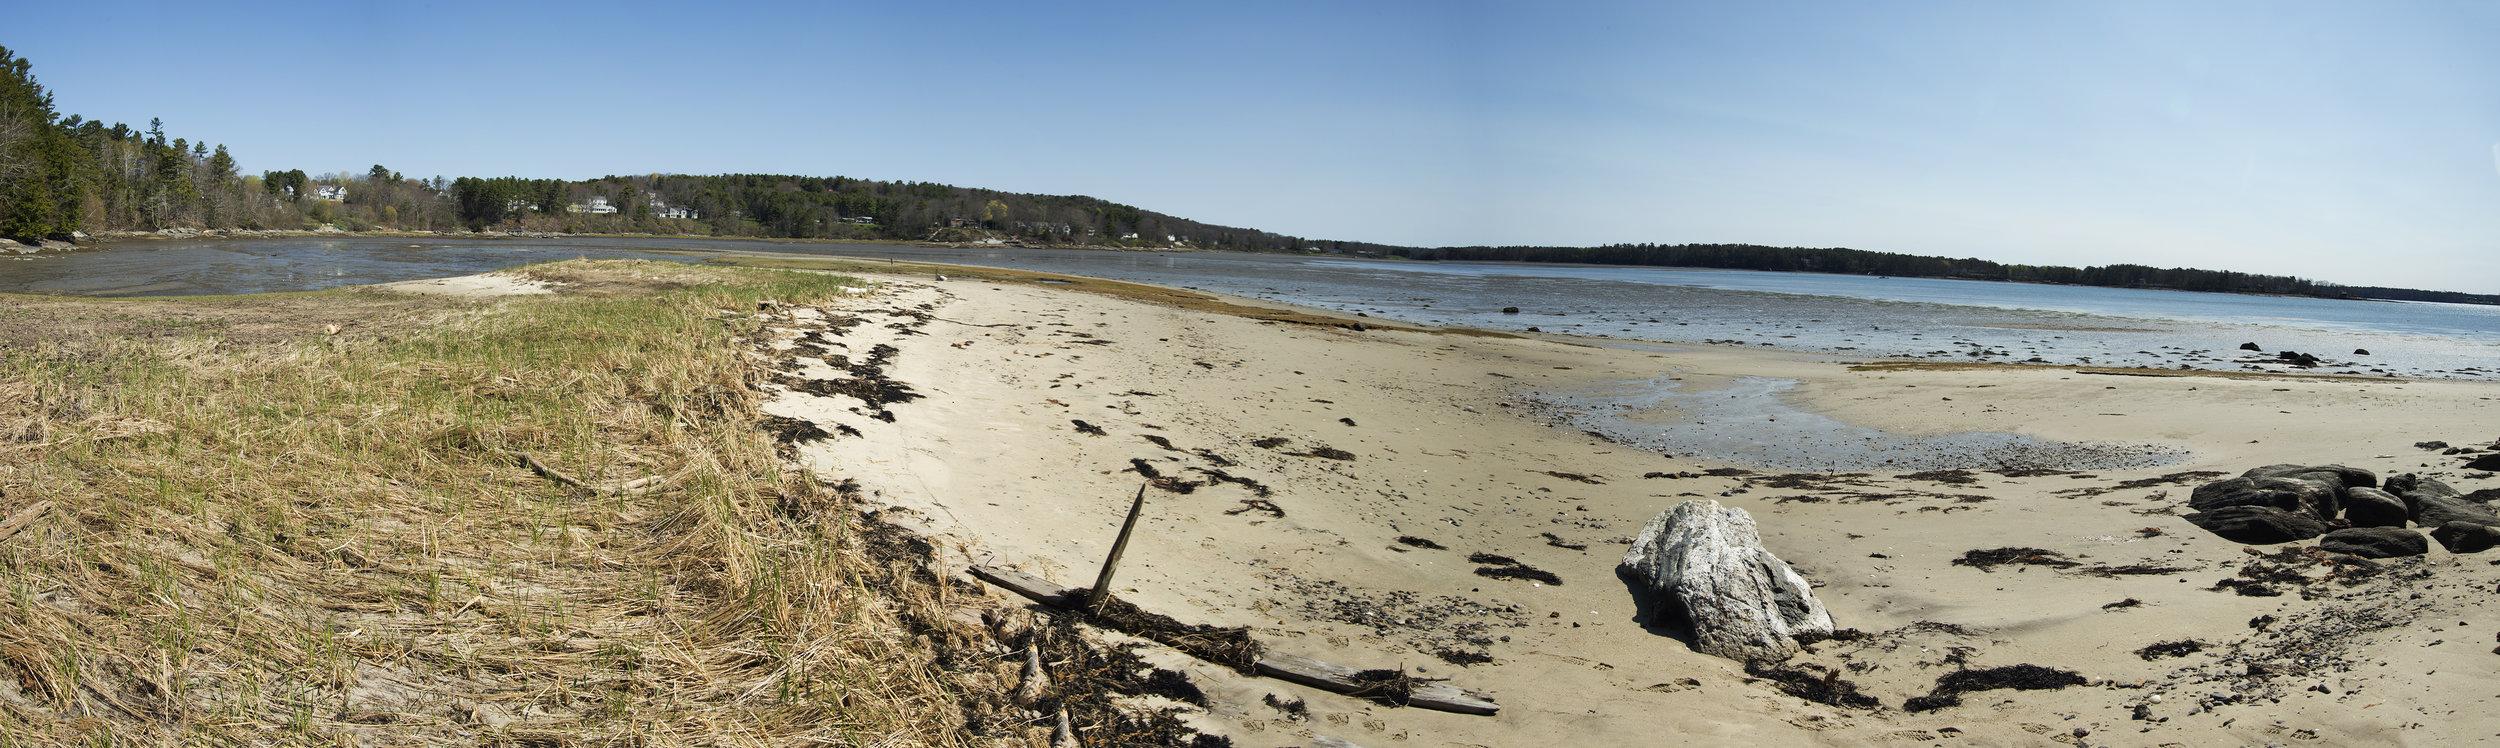 Broad Cove Reserve (Steve Thomas) 1.jpg